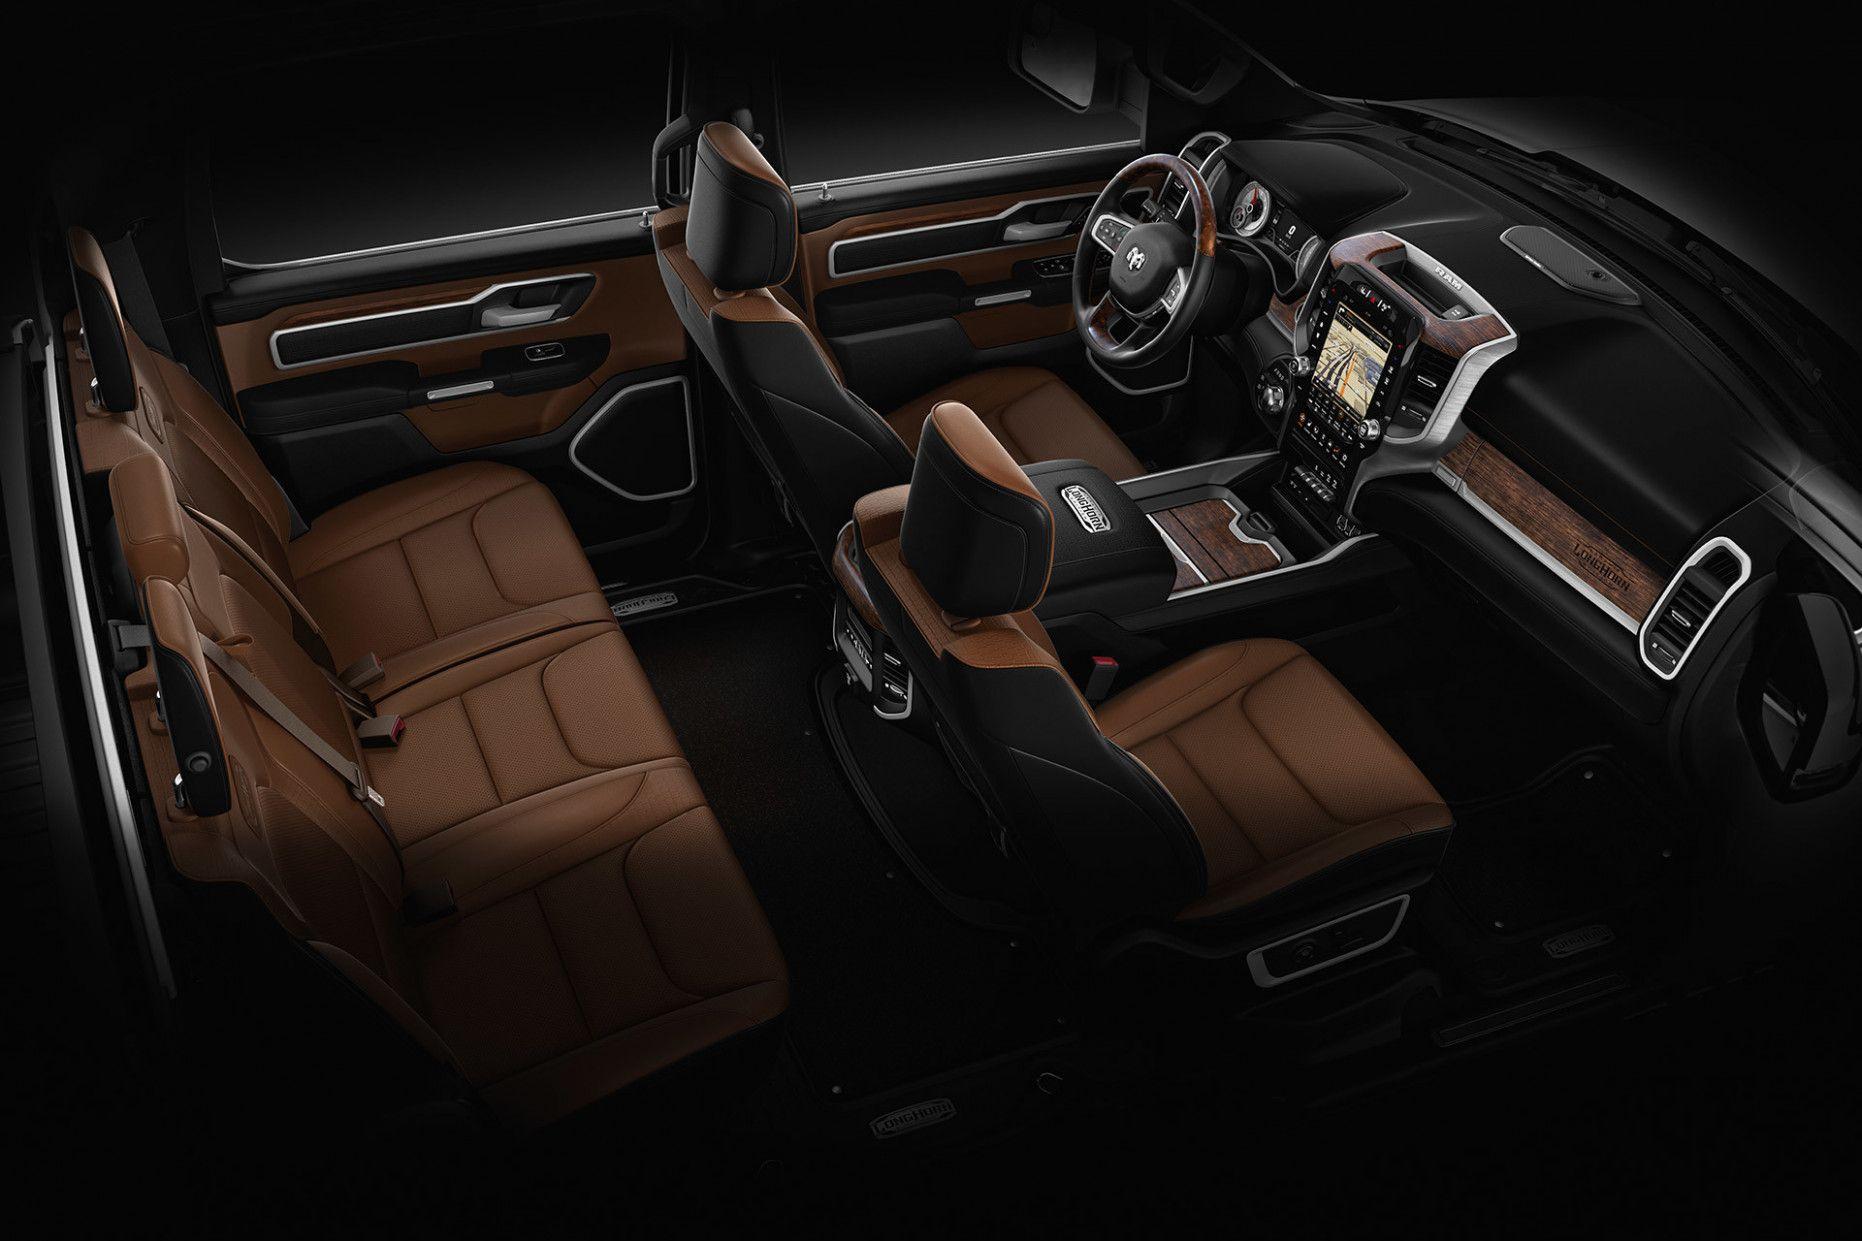 2020 Dodge 2500 Interior Exterior In 2020 Dodge Ram Dodge Subcompact Suv